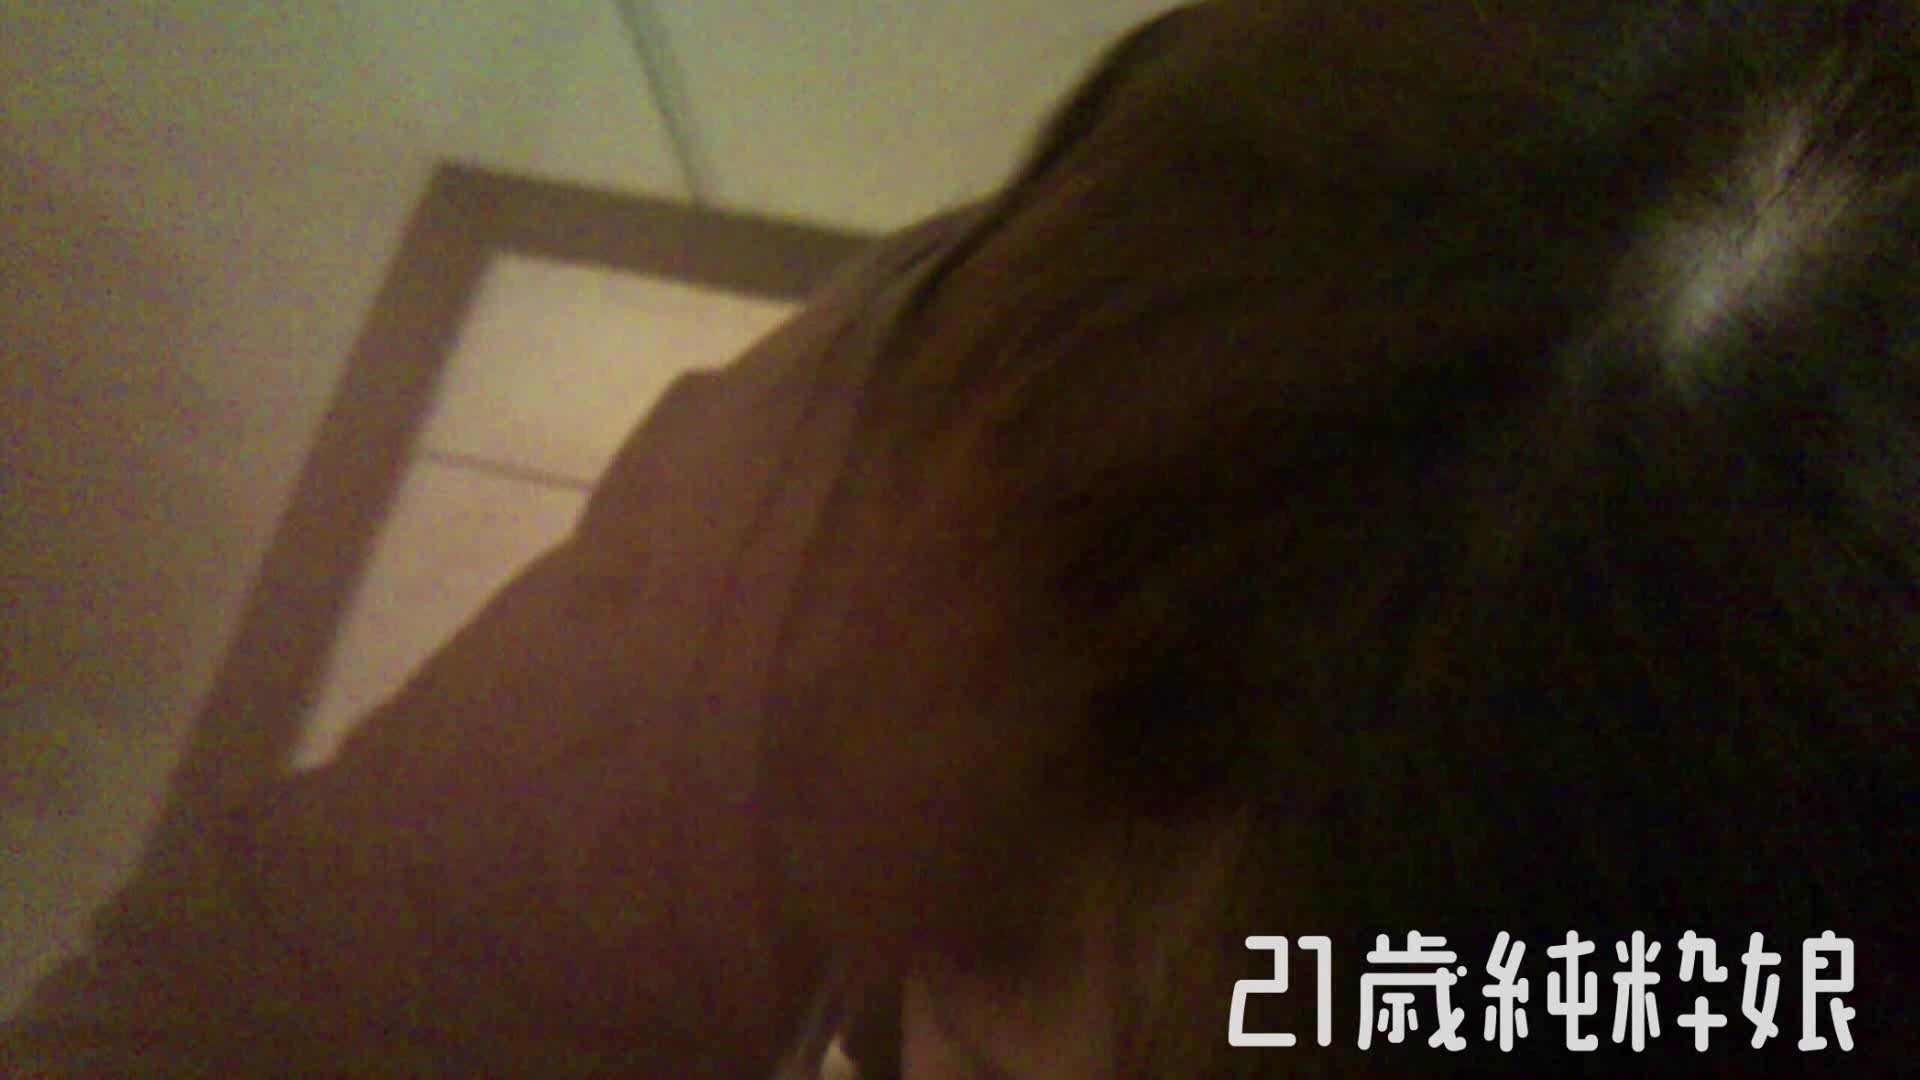 Gカップ21歳純粋嬢第2弾Vol.5 OLヌード天国 | 学校  110PIX 53